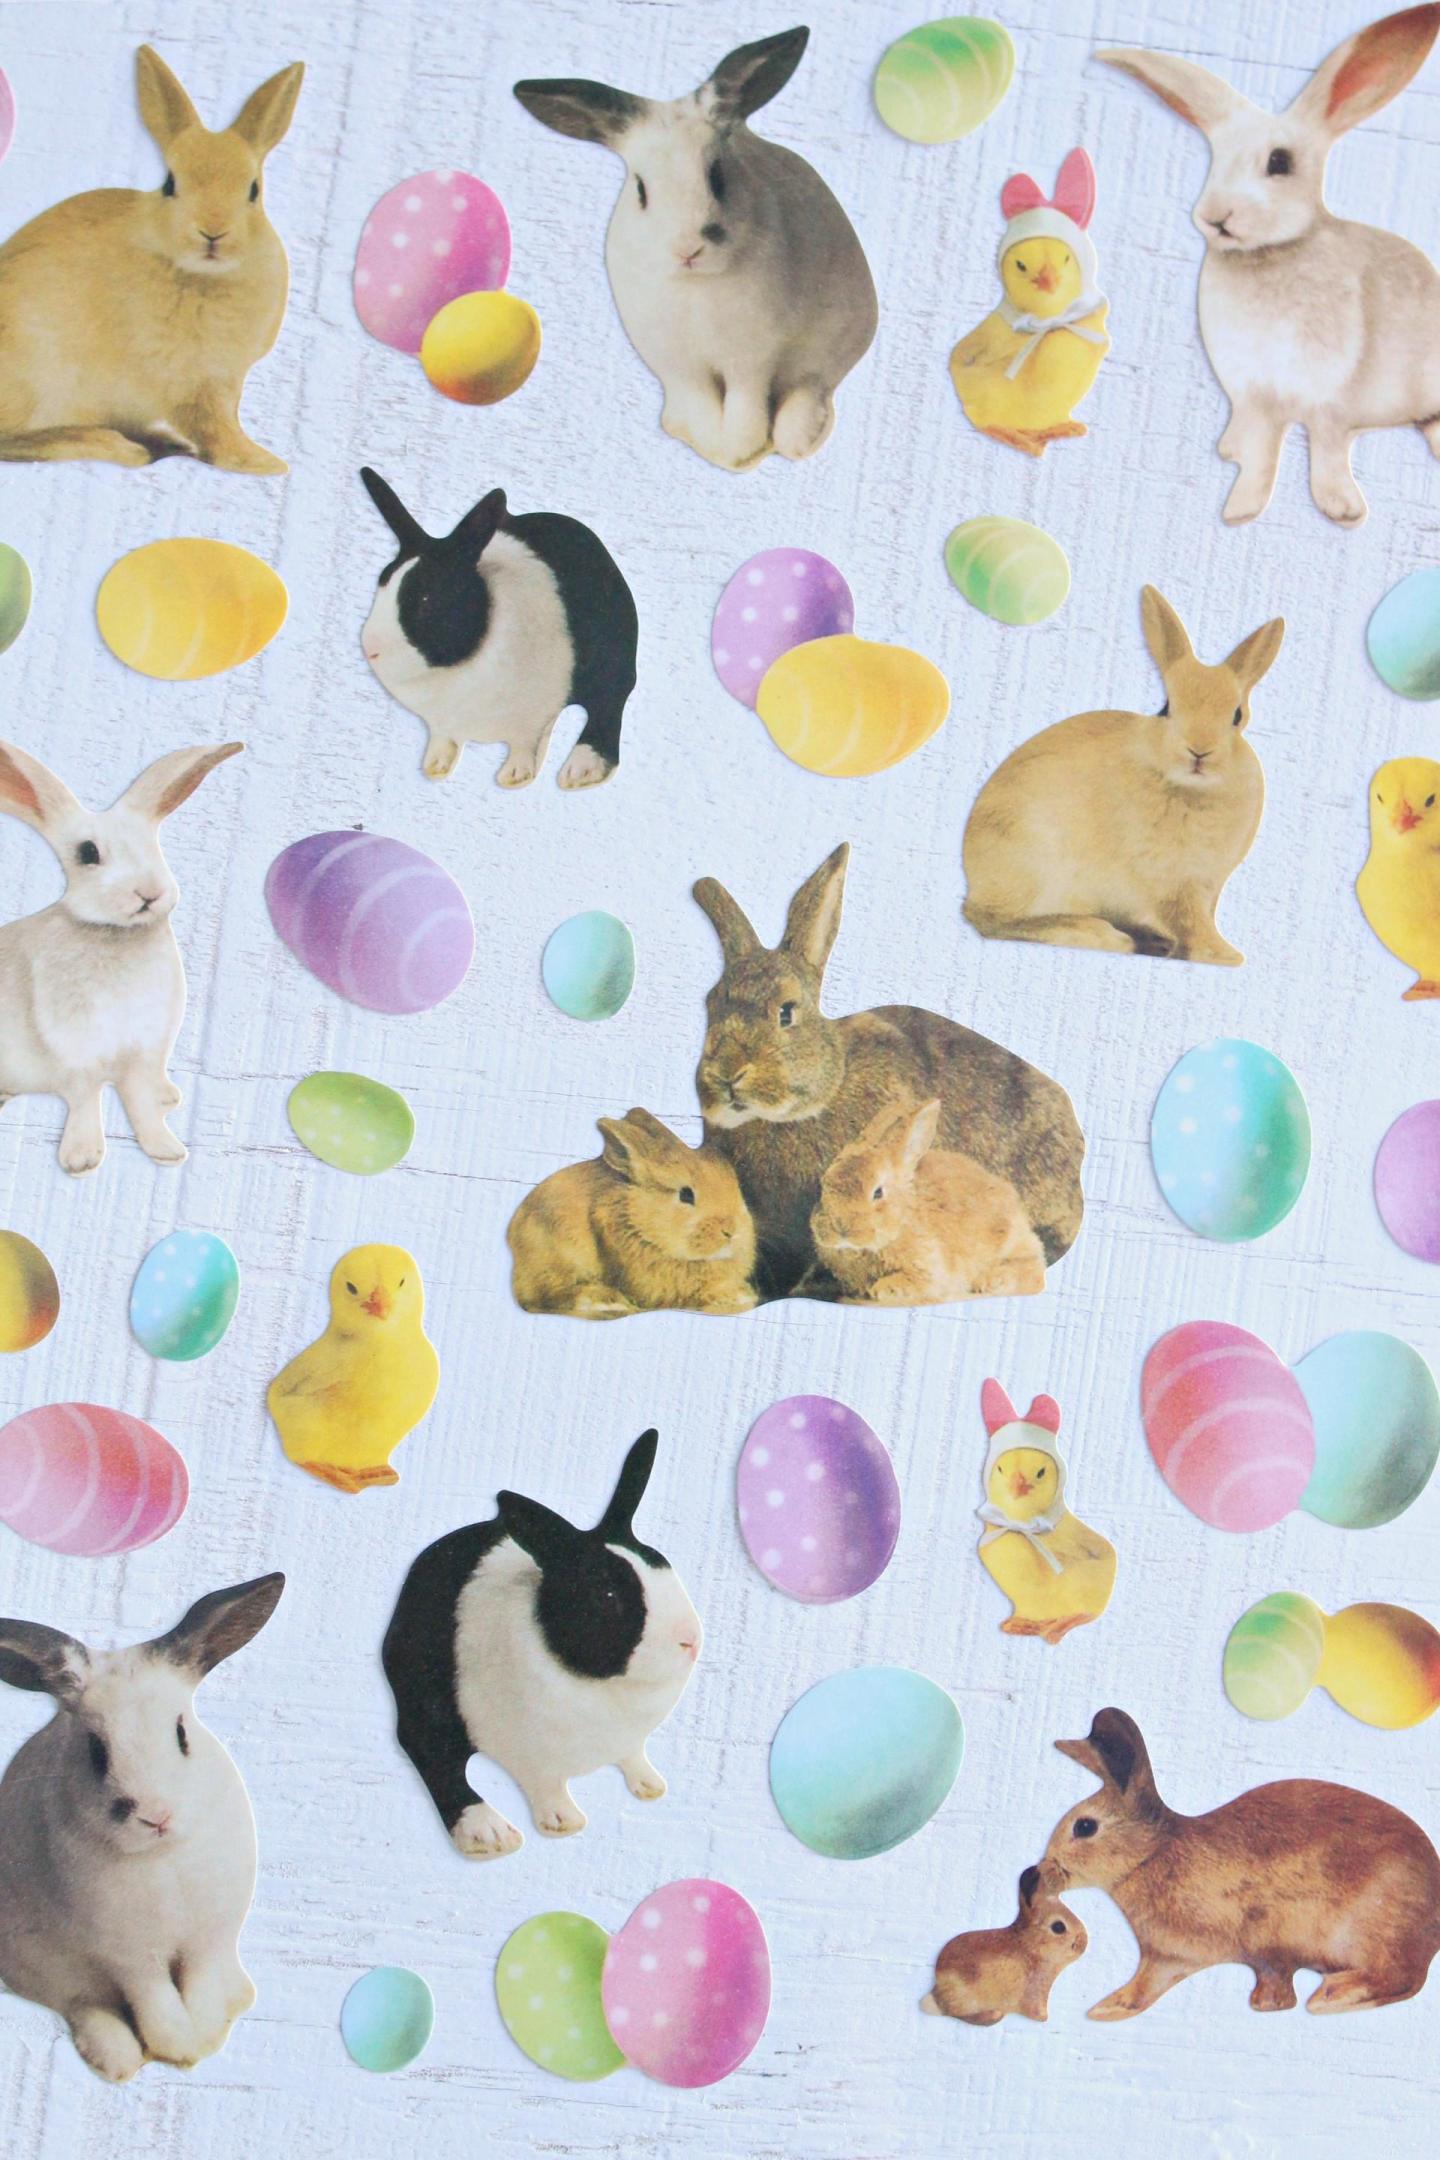 Bunny stickers